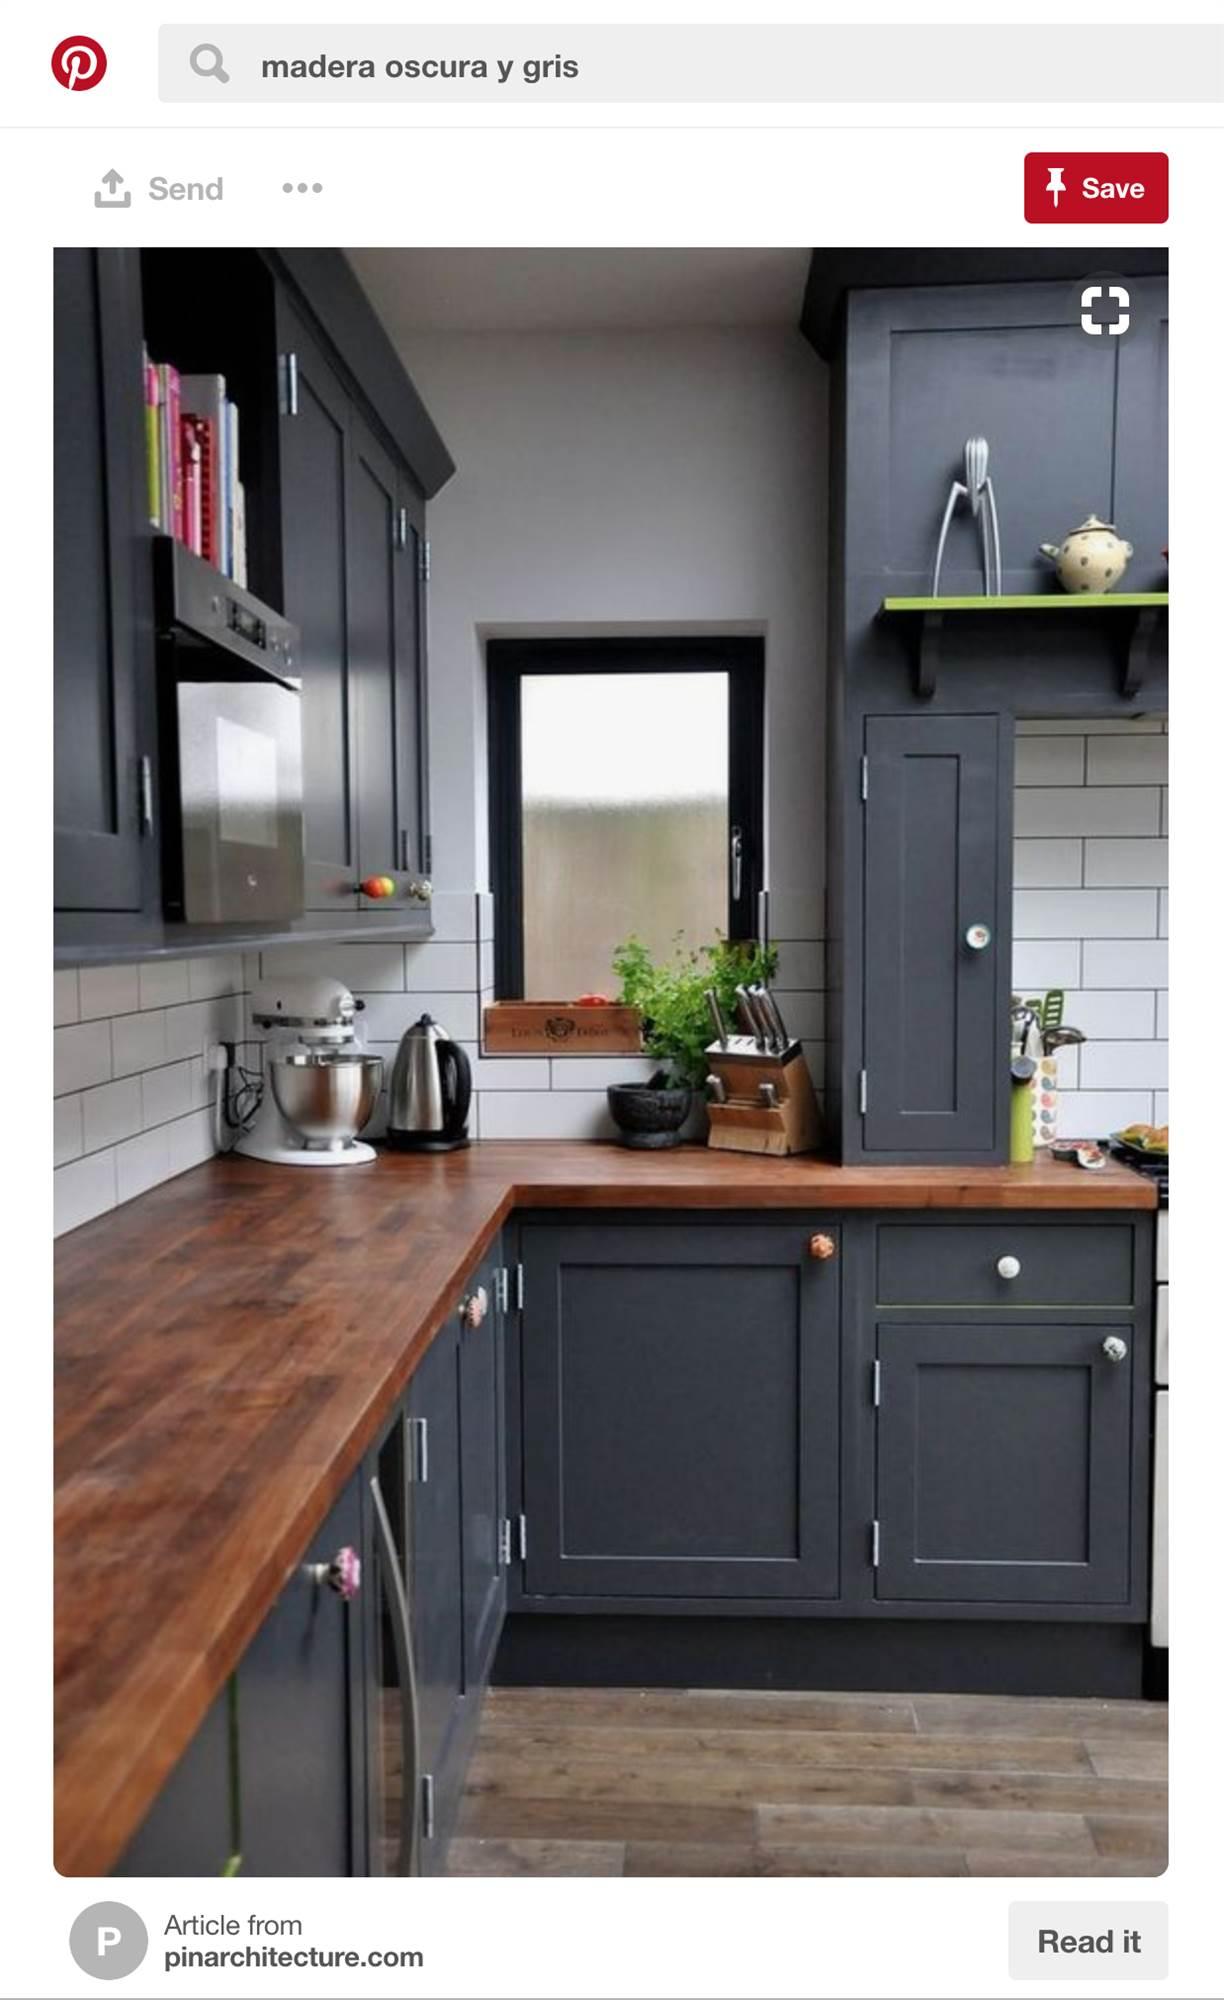 madera oscura 2. cocina de madera oscura 2